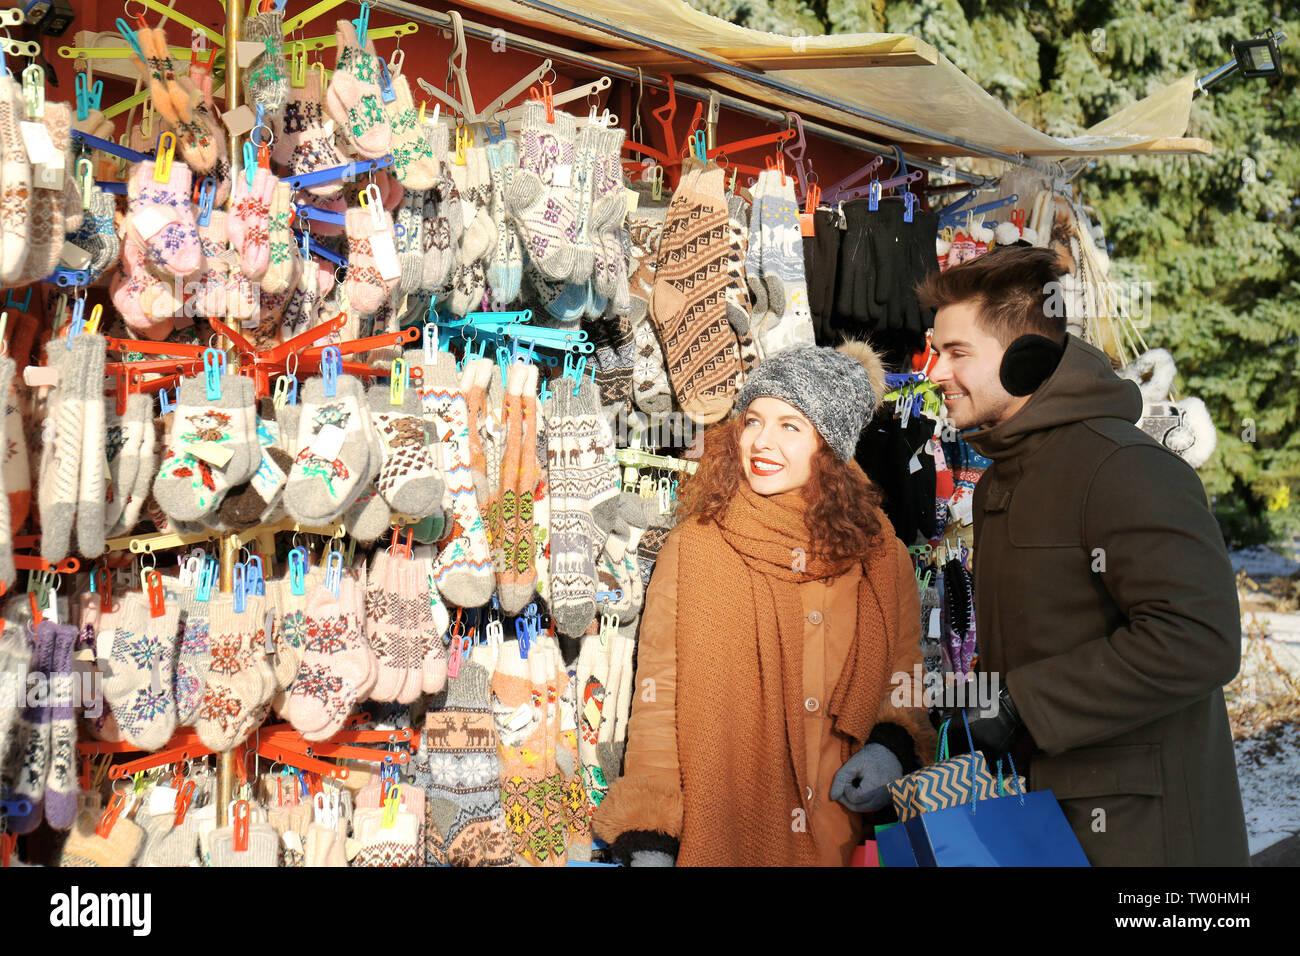 Woman and man shopping on Christmas market - Stock Image